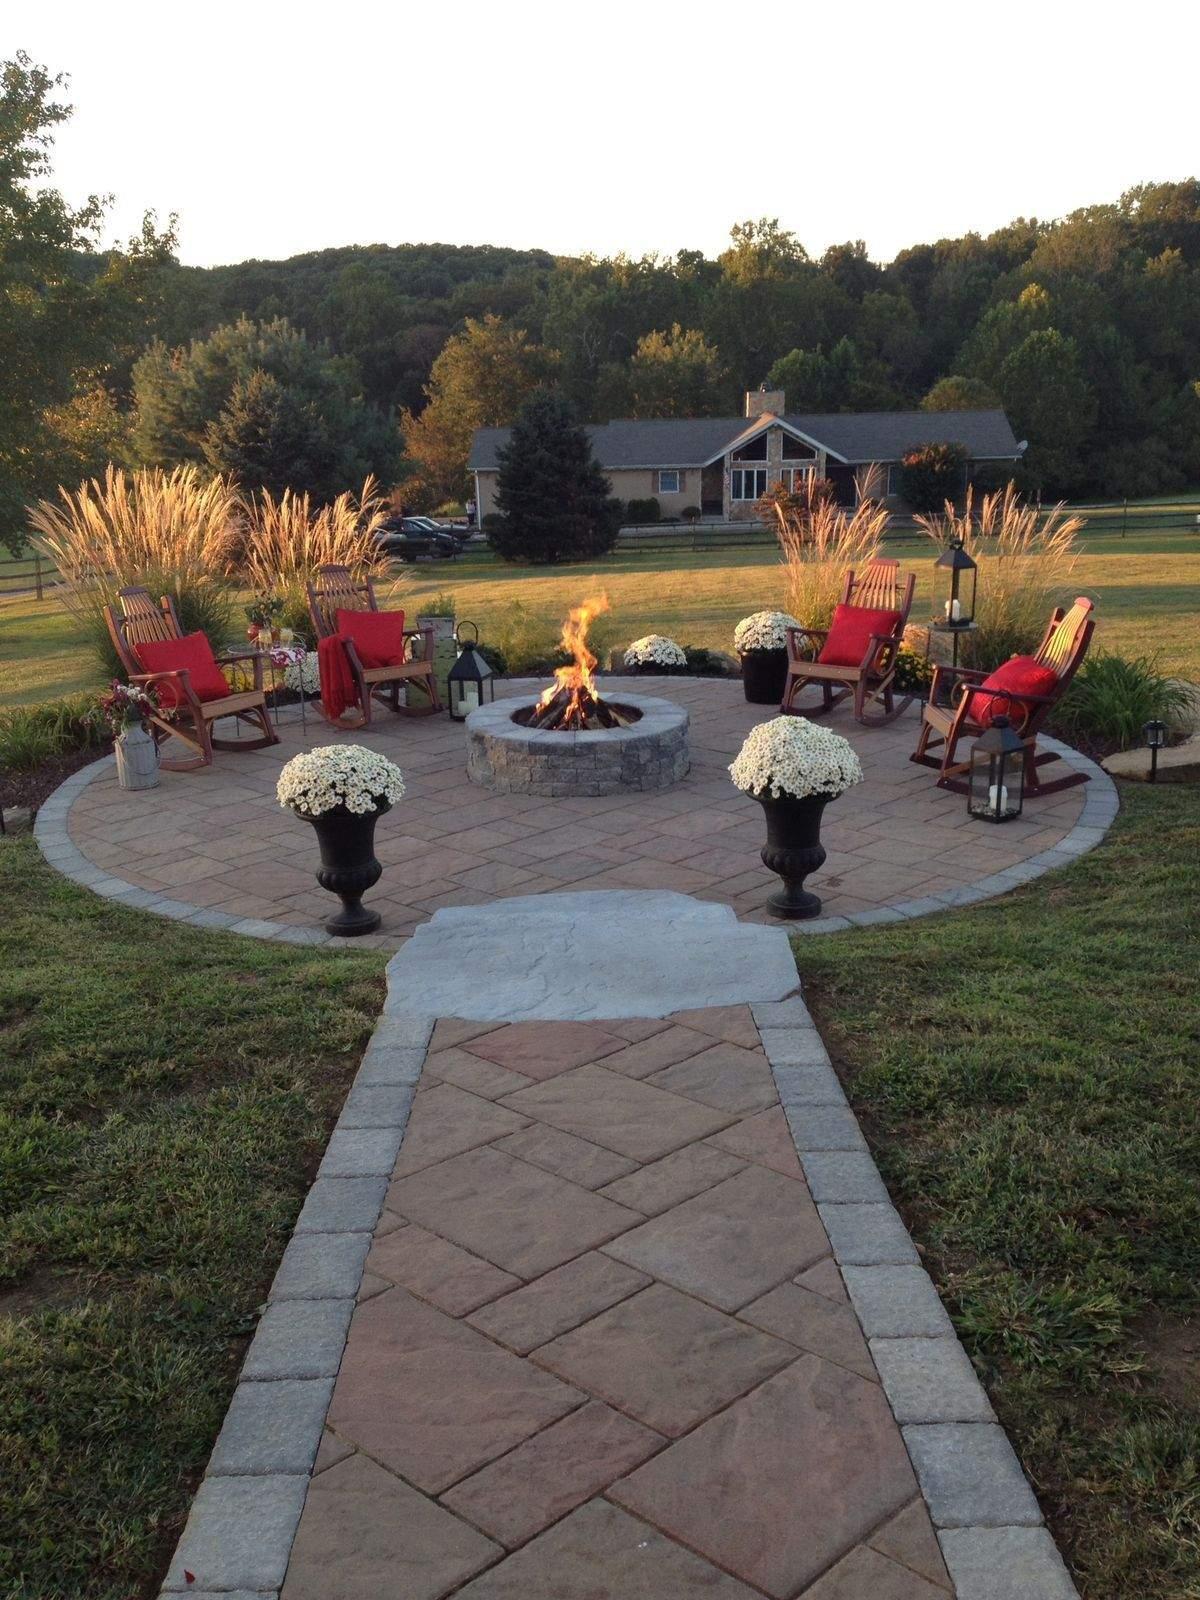 Feuerstelle Garten Bauen Elegant The Ultimate Backyard Patio Ideas With Guide Featuring Garten Anlegen